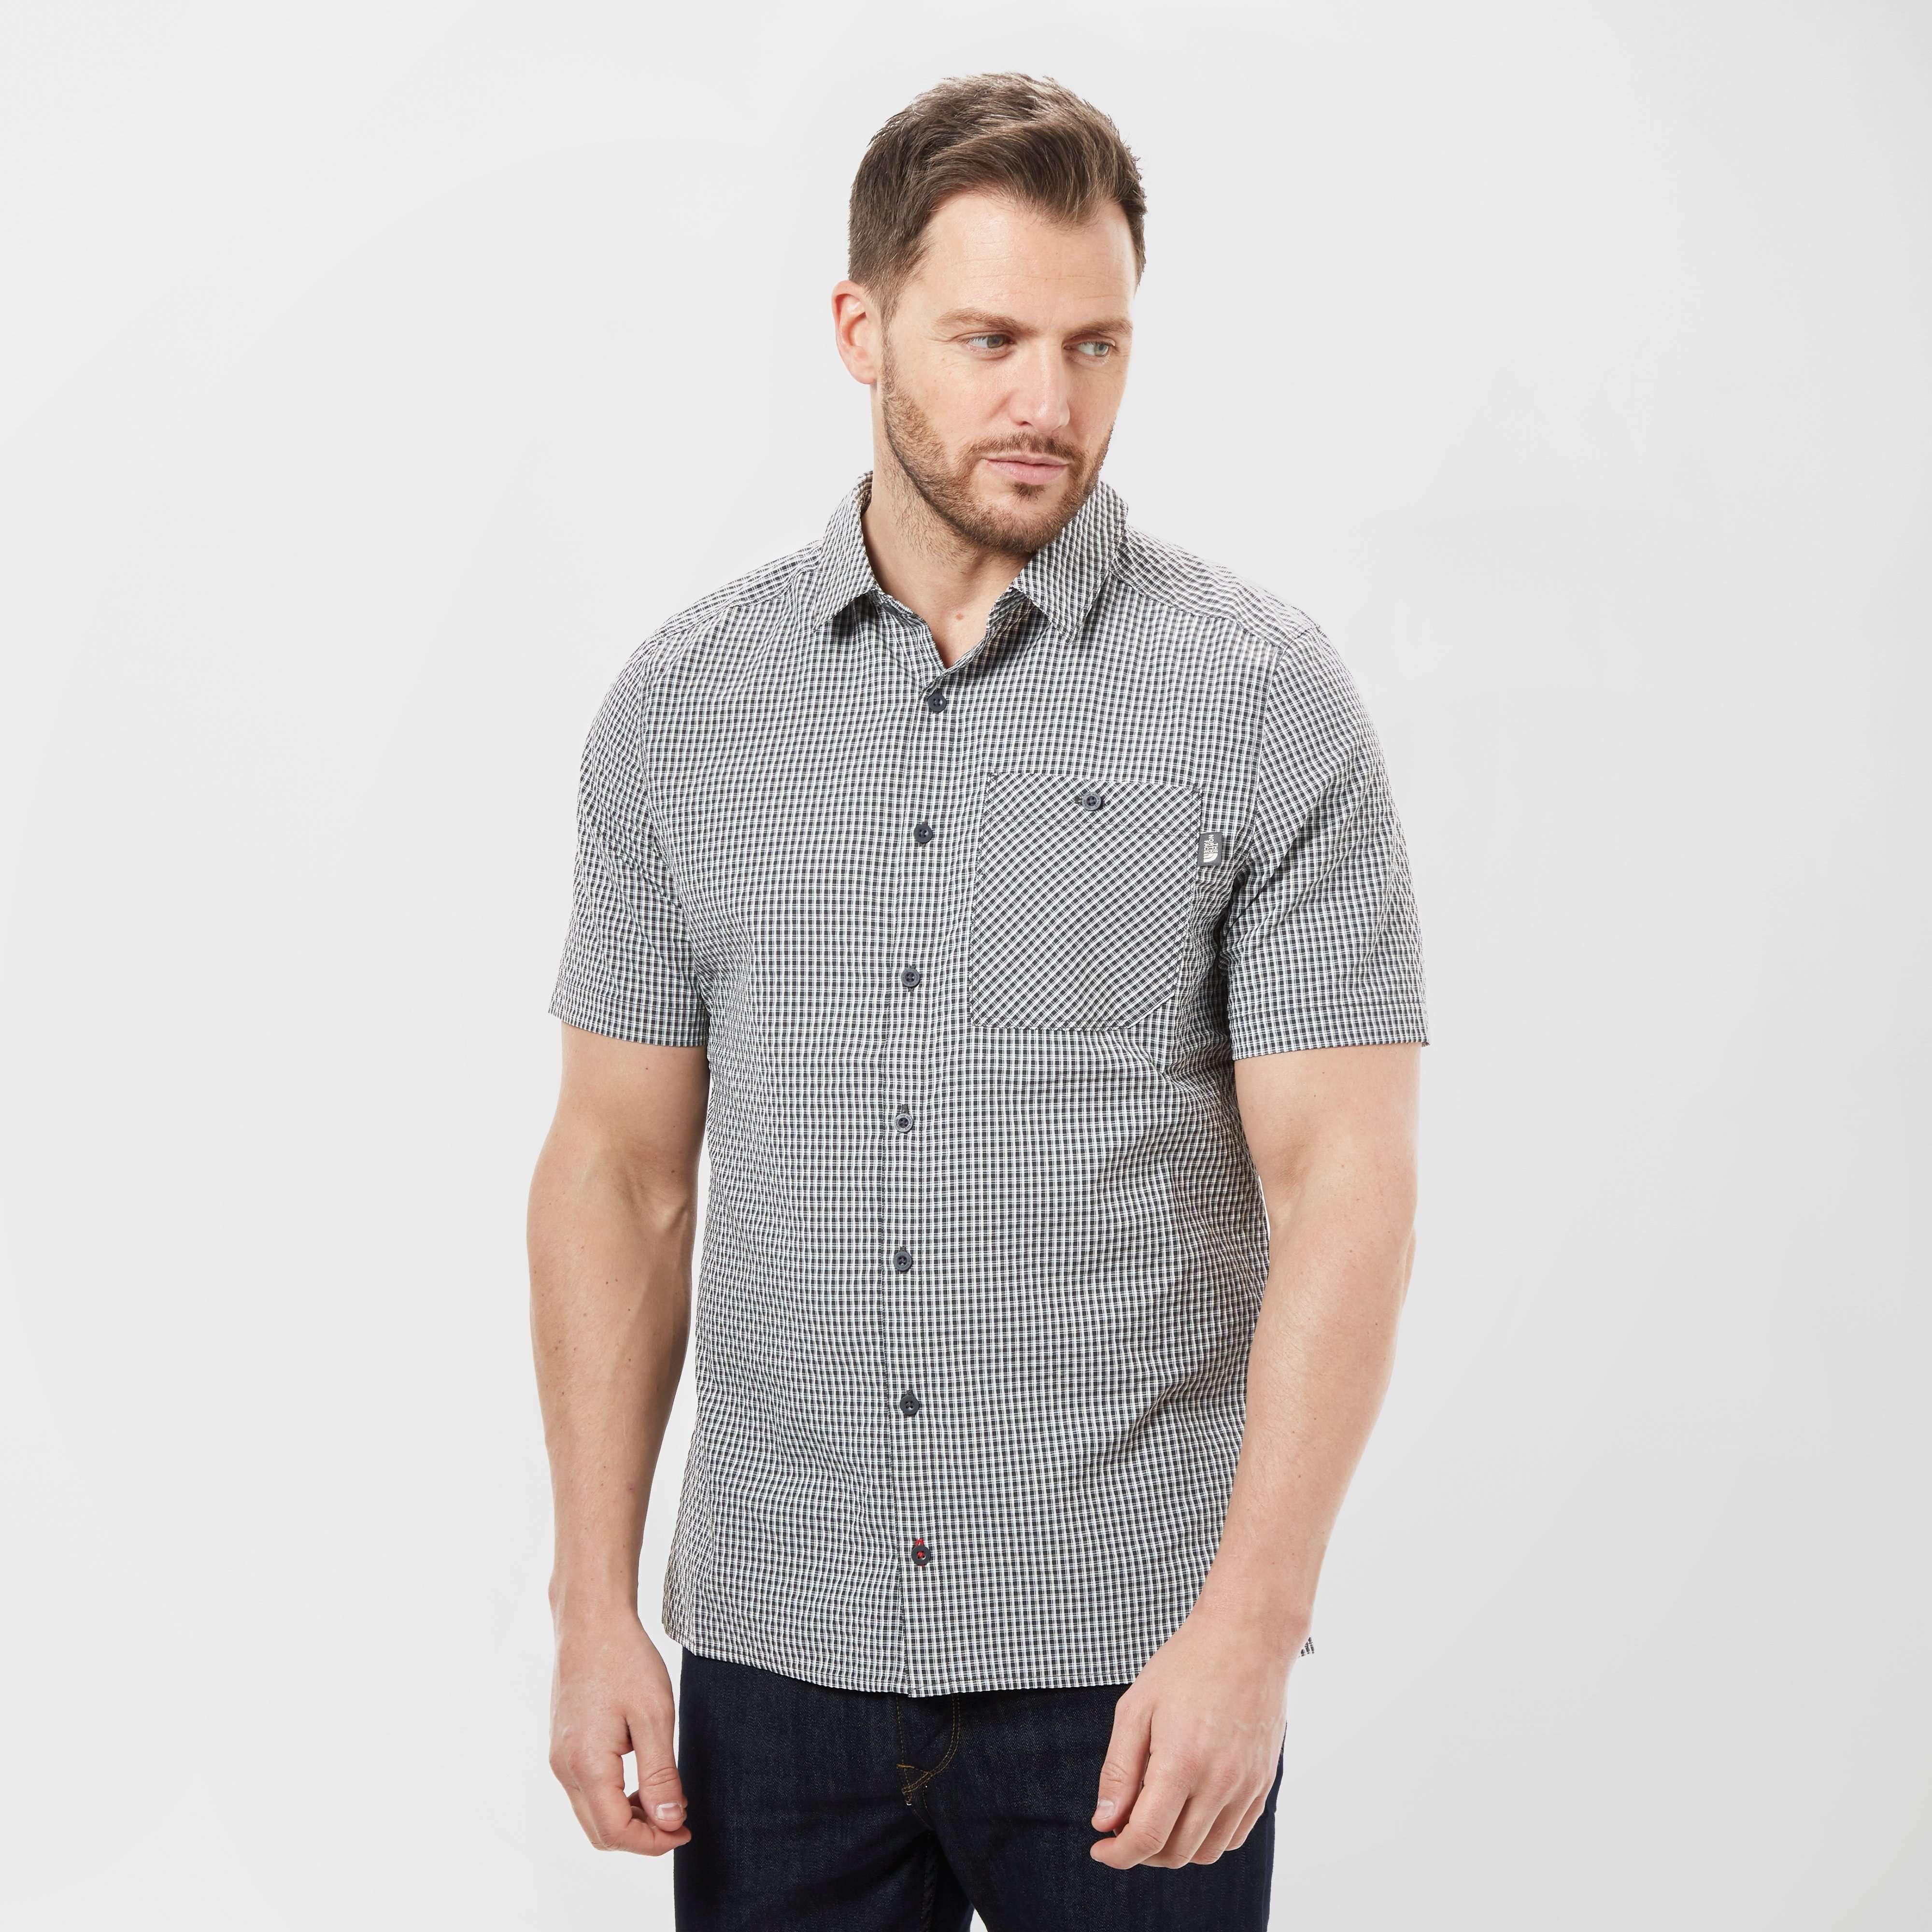 THE NORTH FACE Men's Short Sleeve Hypress Shirt